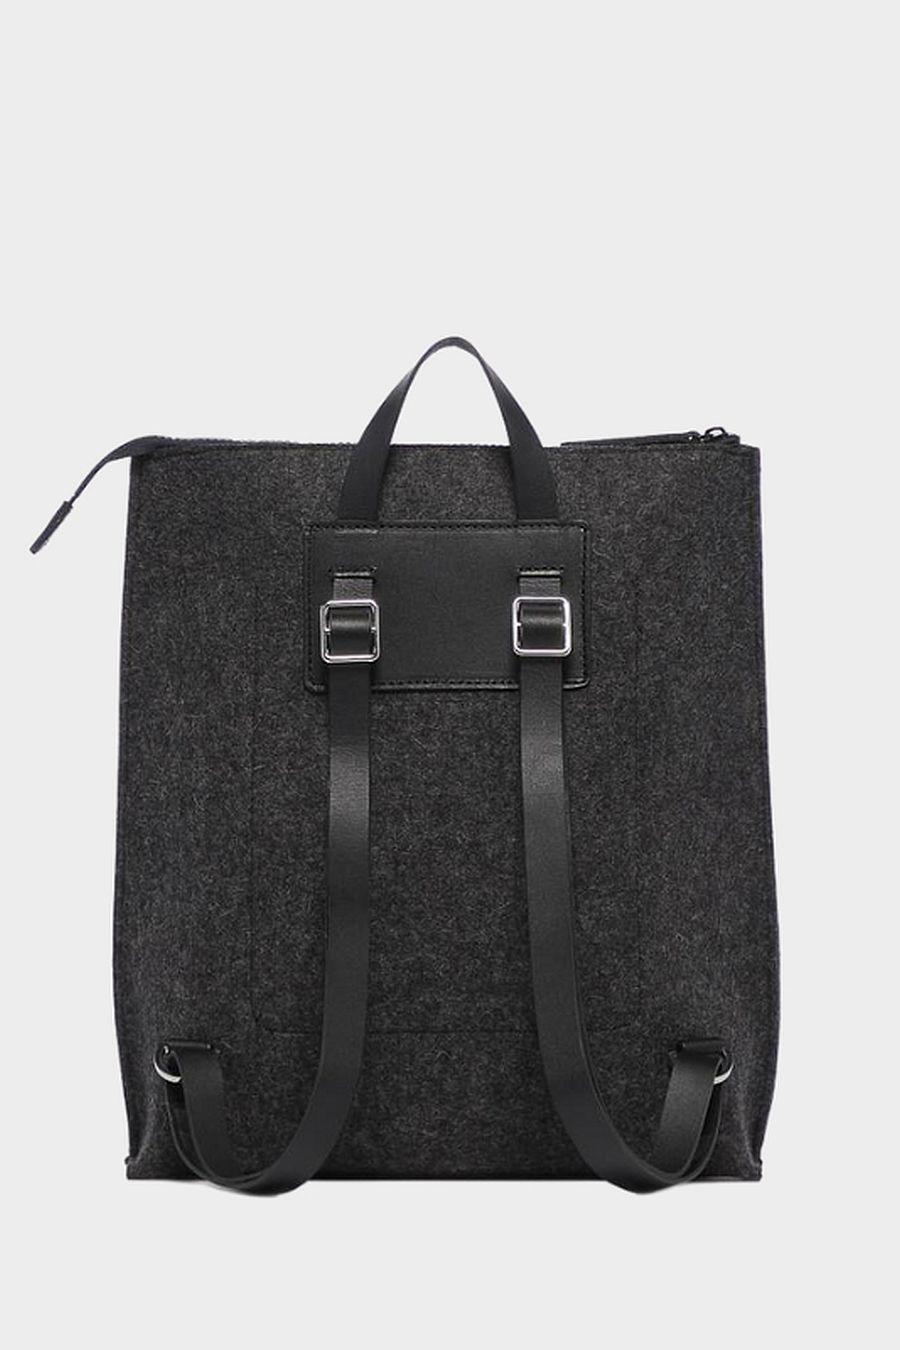 Graf Lantz Hana Backpack Felt - Charcoal